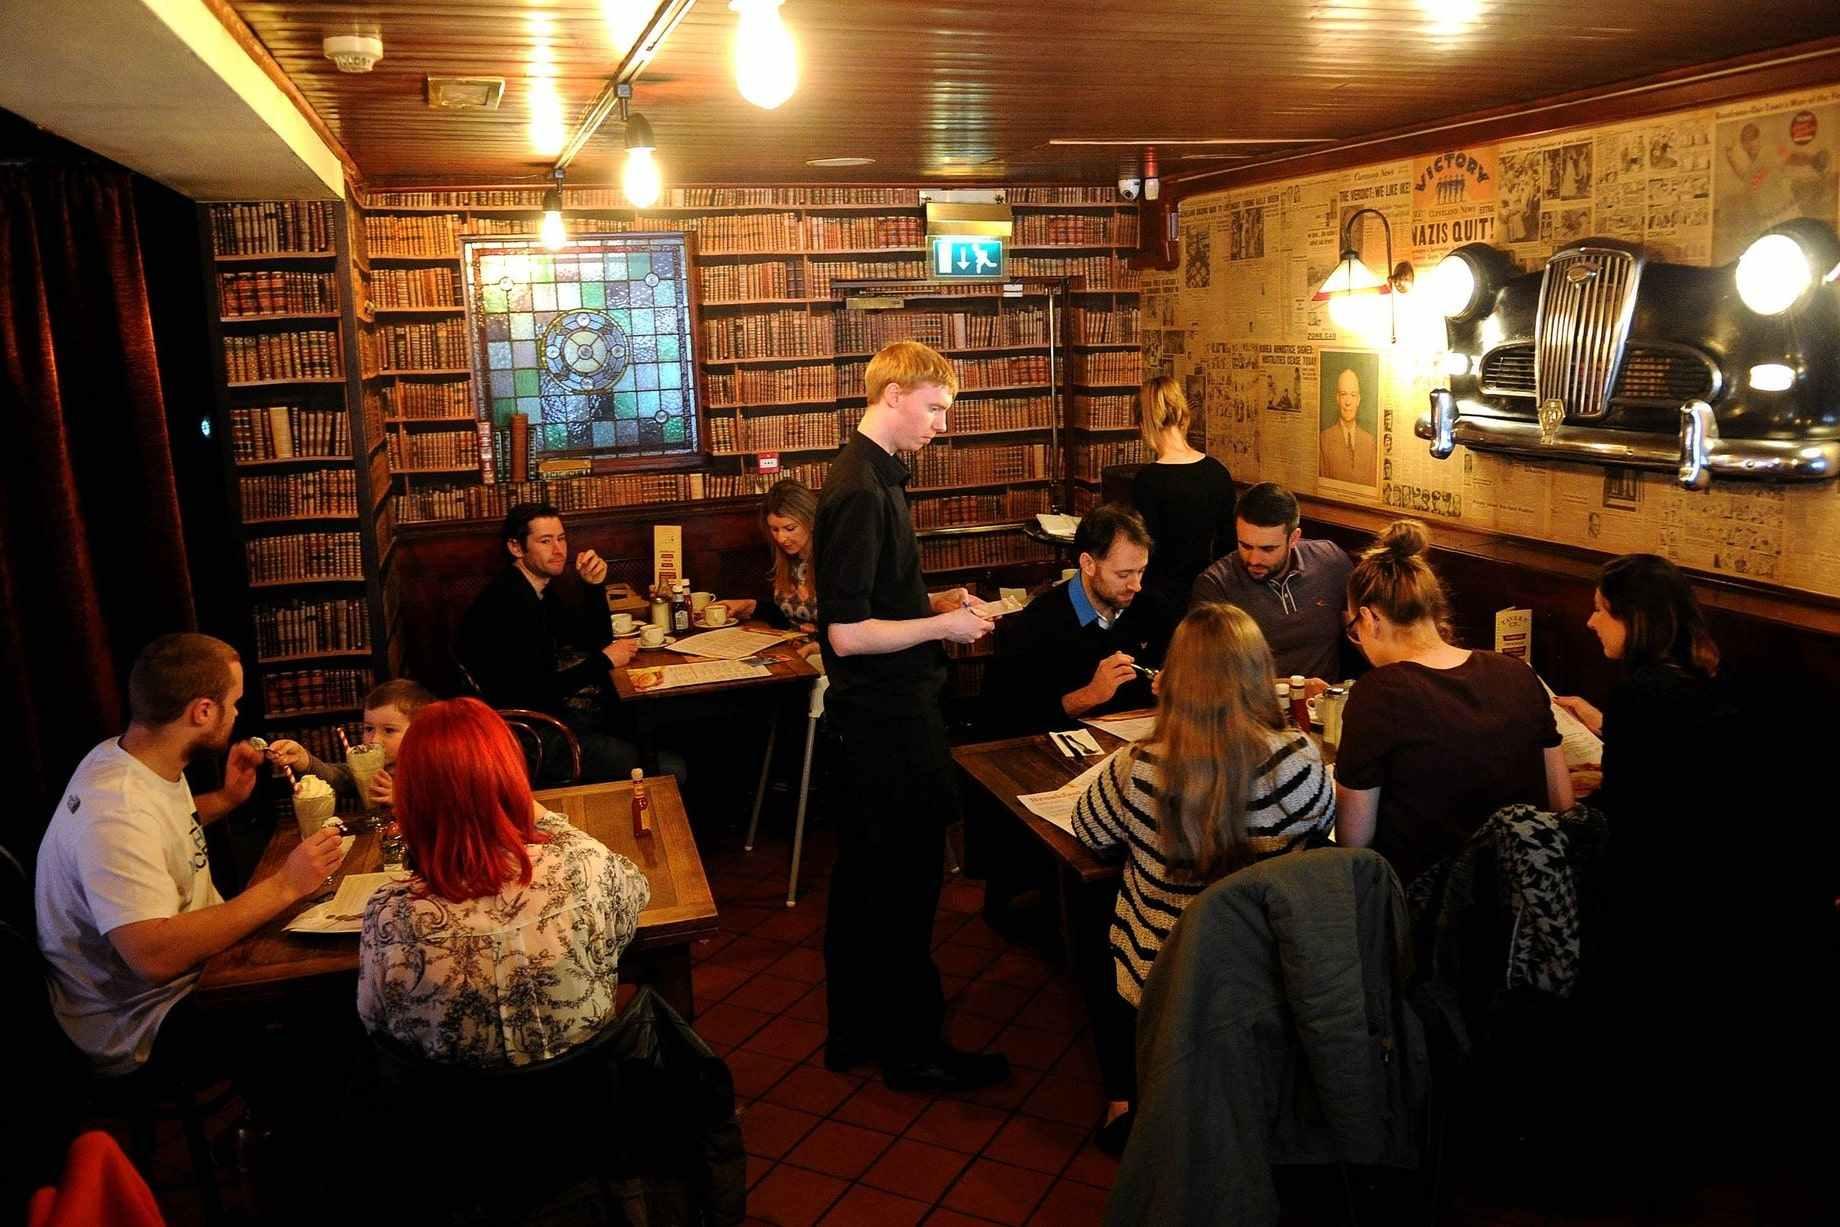 waiter-taking-order-at-restaurant-table-at-the-tavern